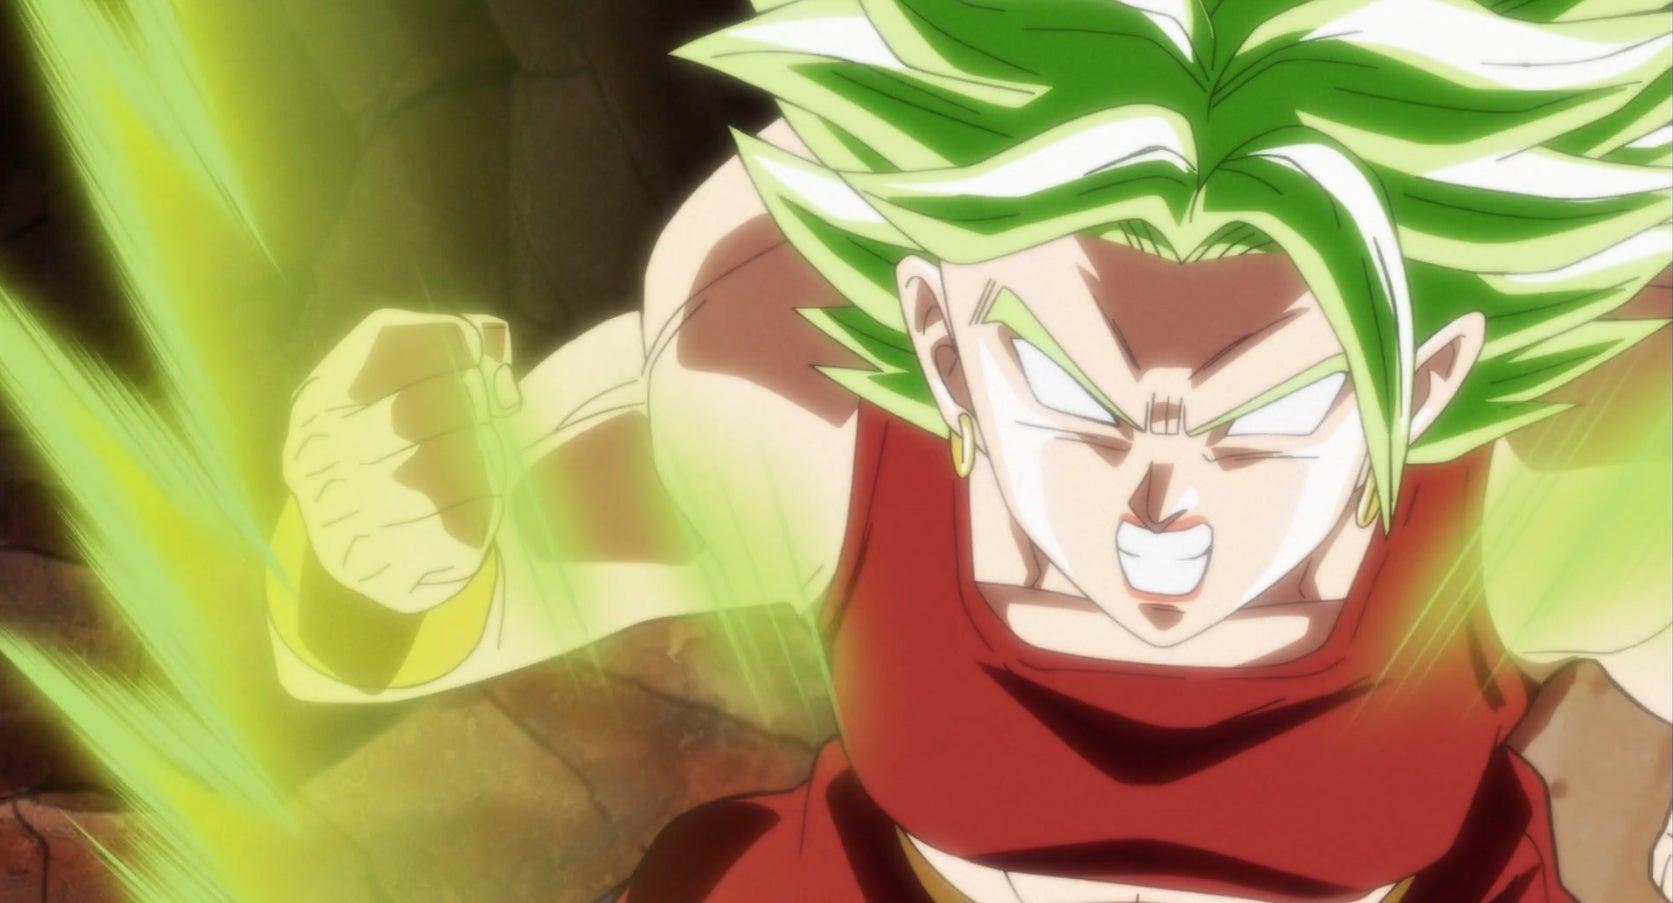 female broly kale legendary super saiyan by windyechoes-dbbhhdz